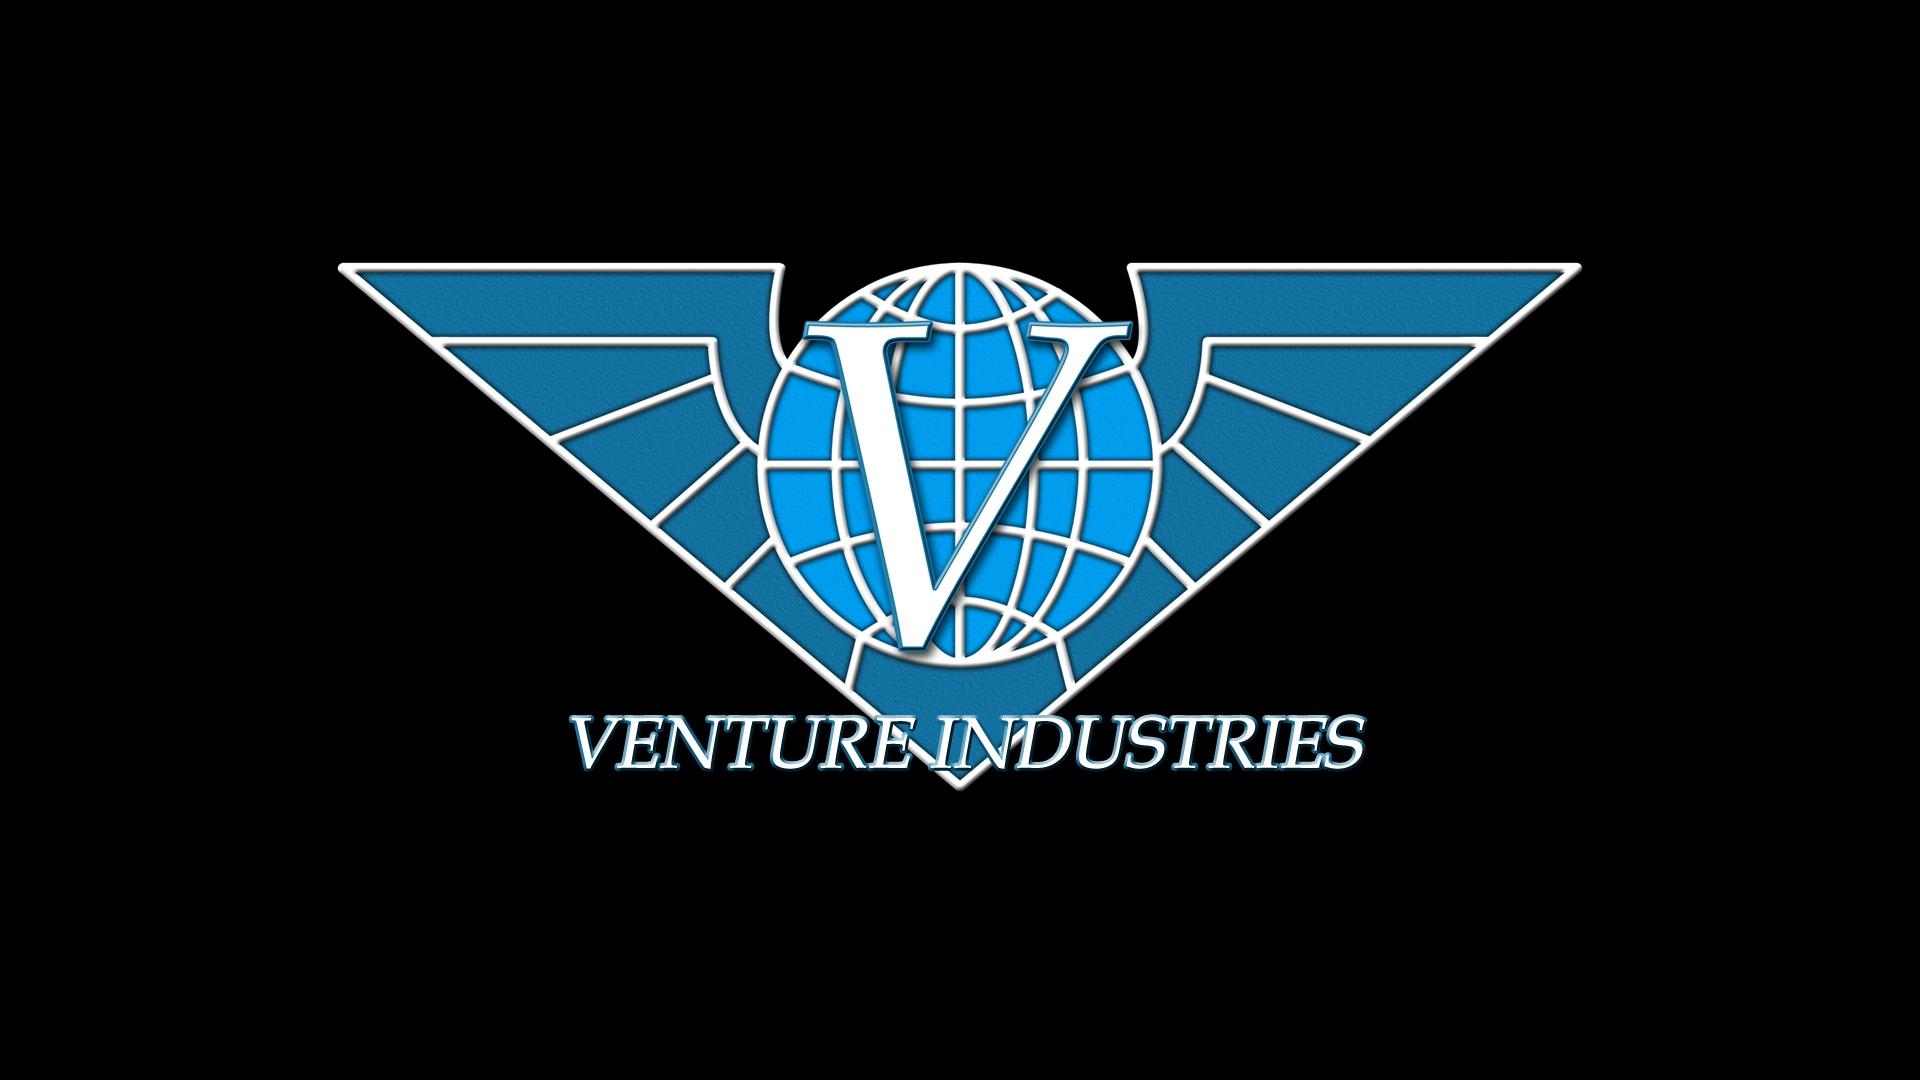 Venture Bros Wallpaper 16   1920 X 1080 stmednet 1920x1080